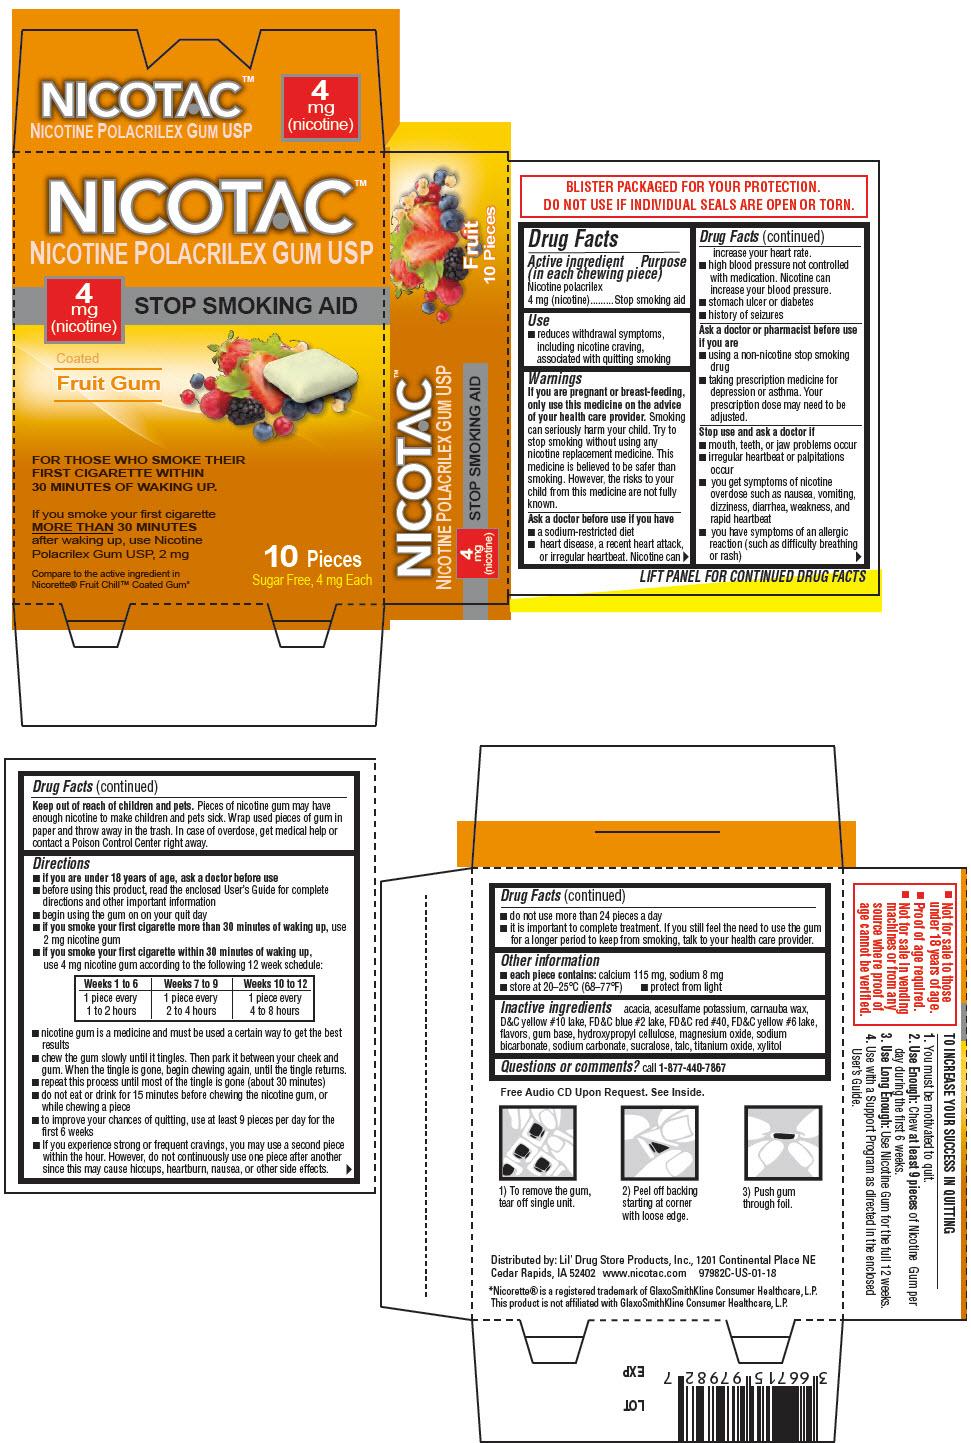 PRINCIPAL DISPLAY PANEL - 4 mg Gum Blister Pack Carton